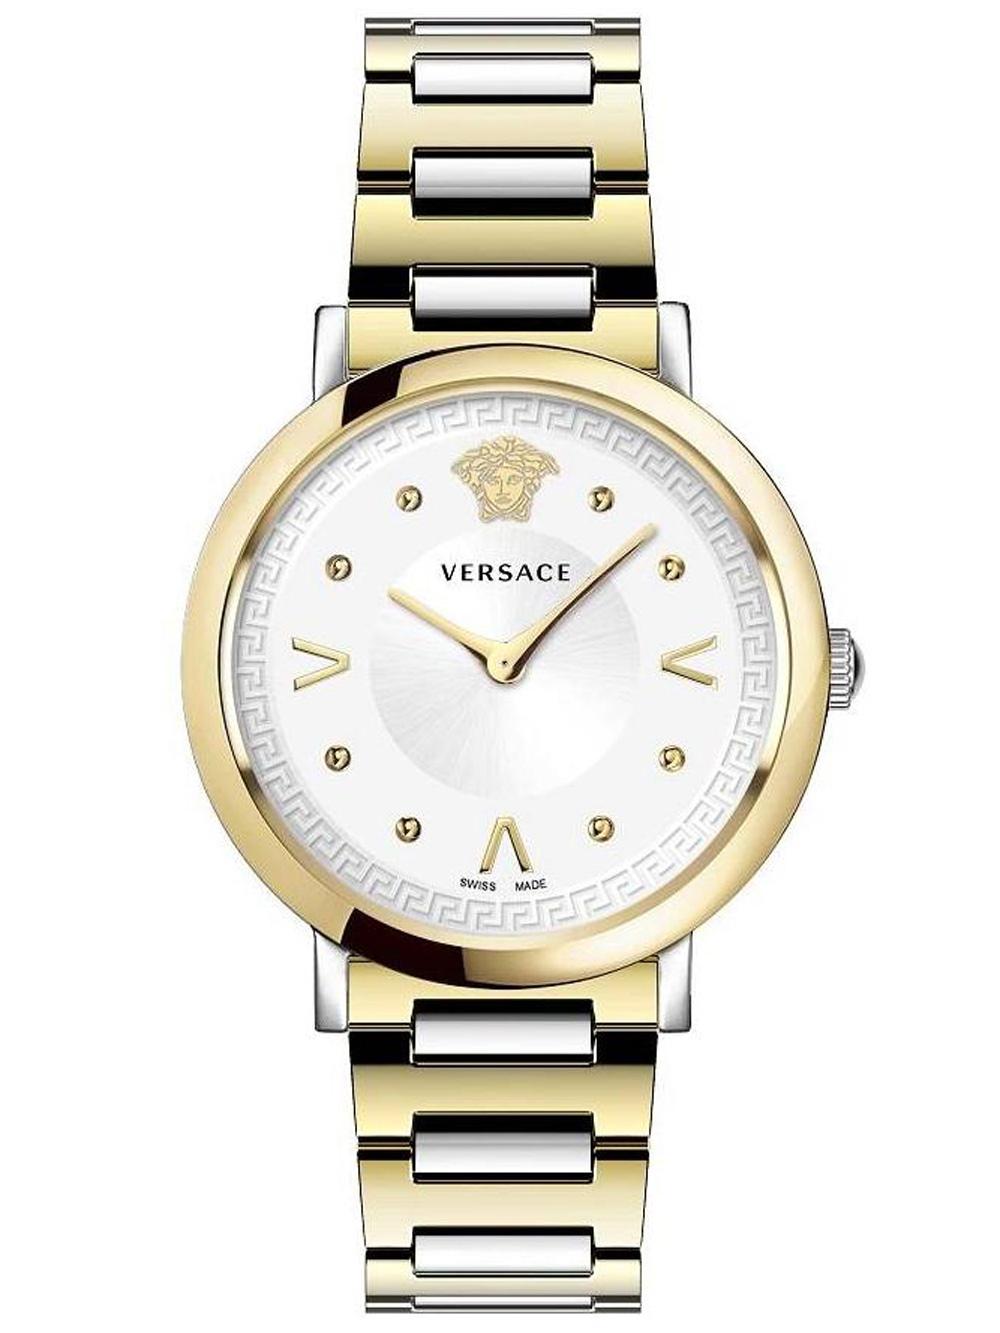 Uhren - Versace VEVD00519 Pop Chic Damen 36mm 5ATM  - Onlineshop Timeshop24